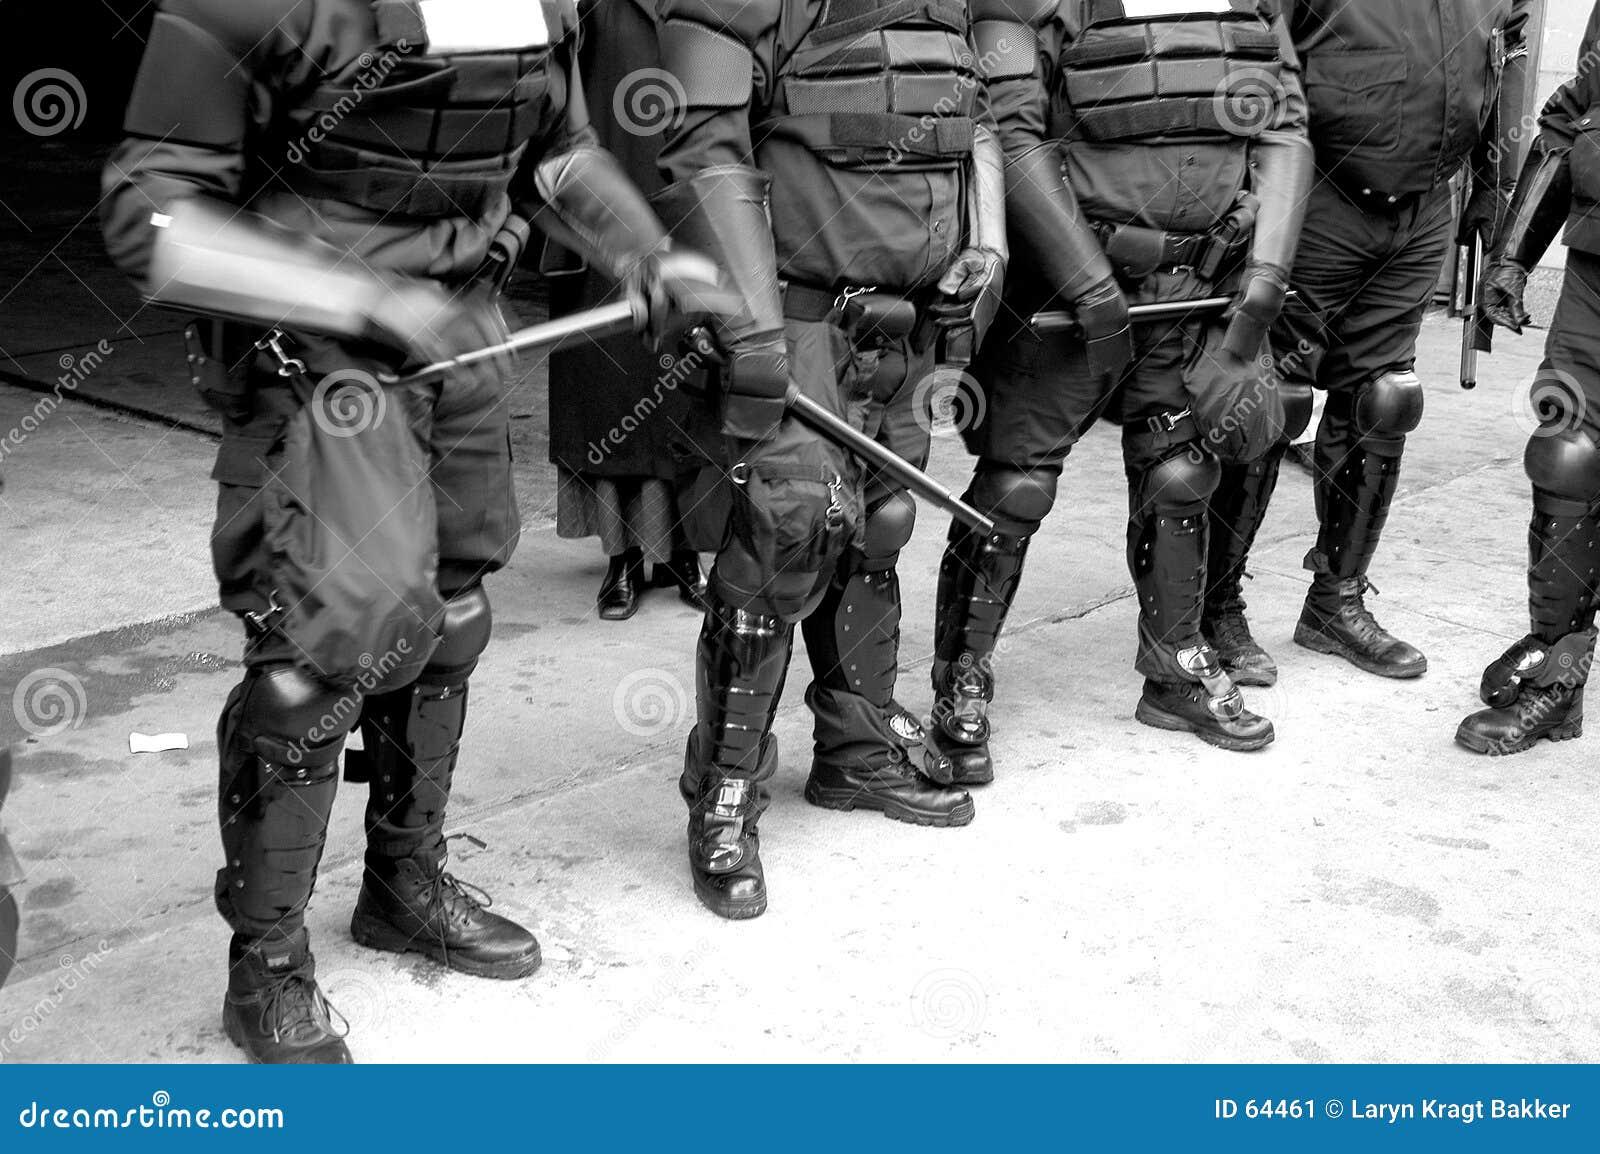 Bodies gear police riot